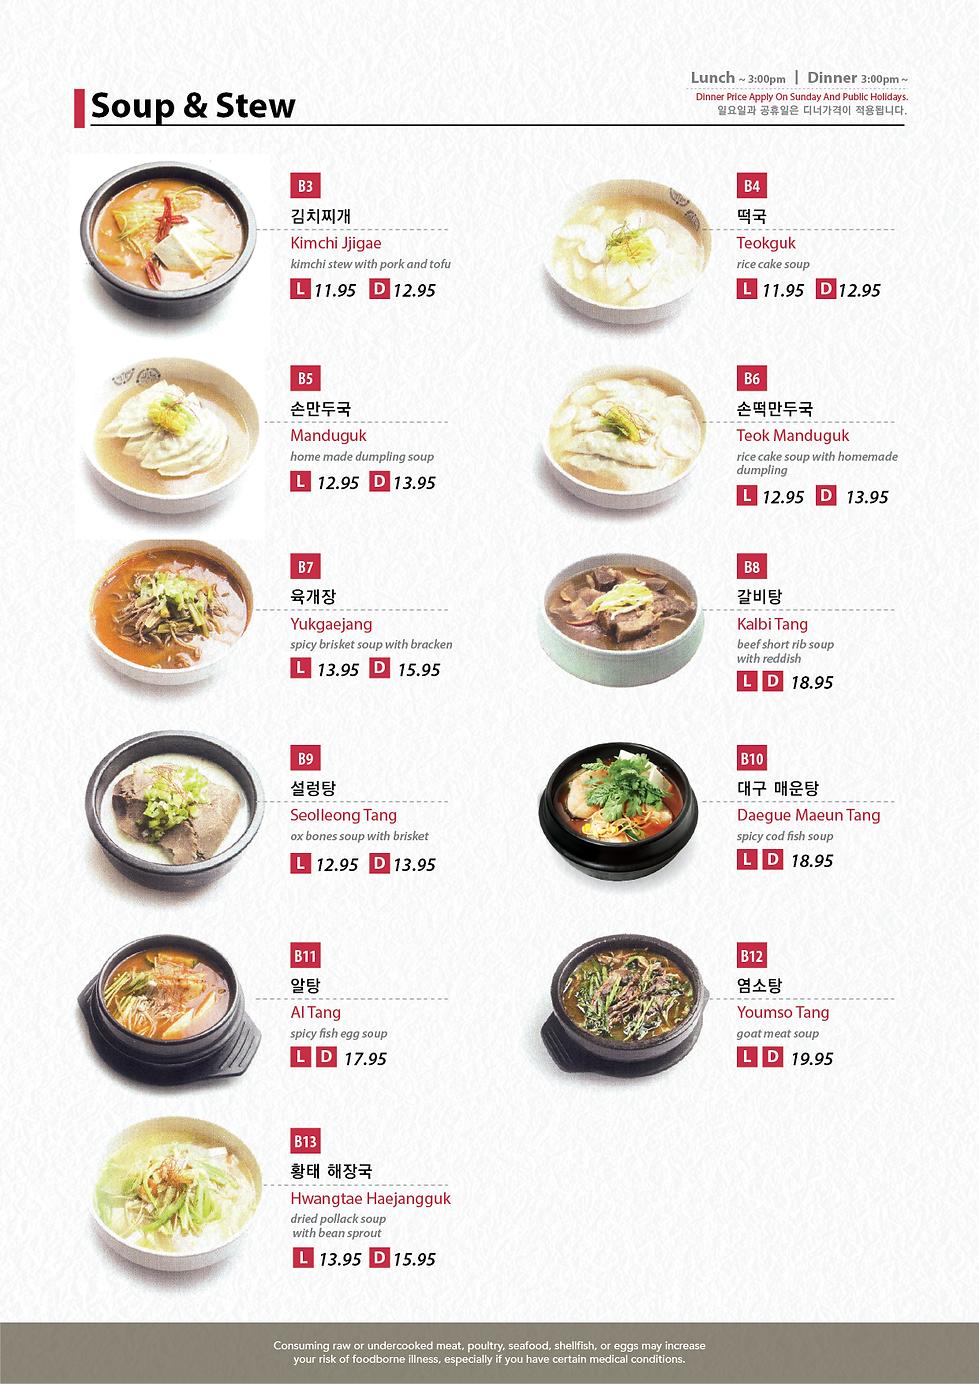 Sura-menu-8.27(W)X11.69(H)-final-093021-05.png